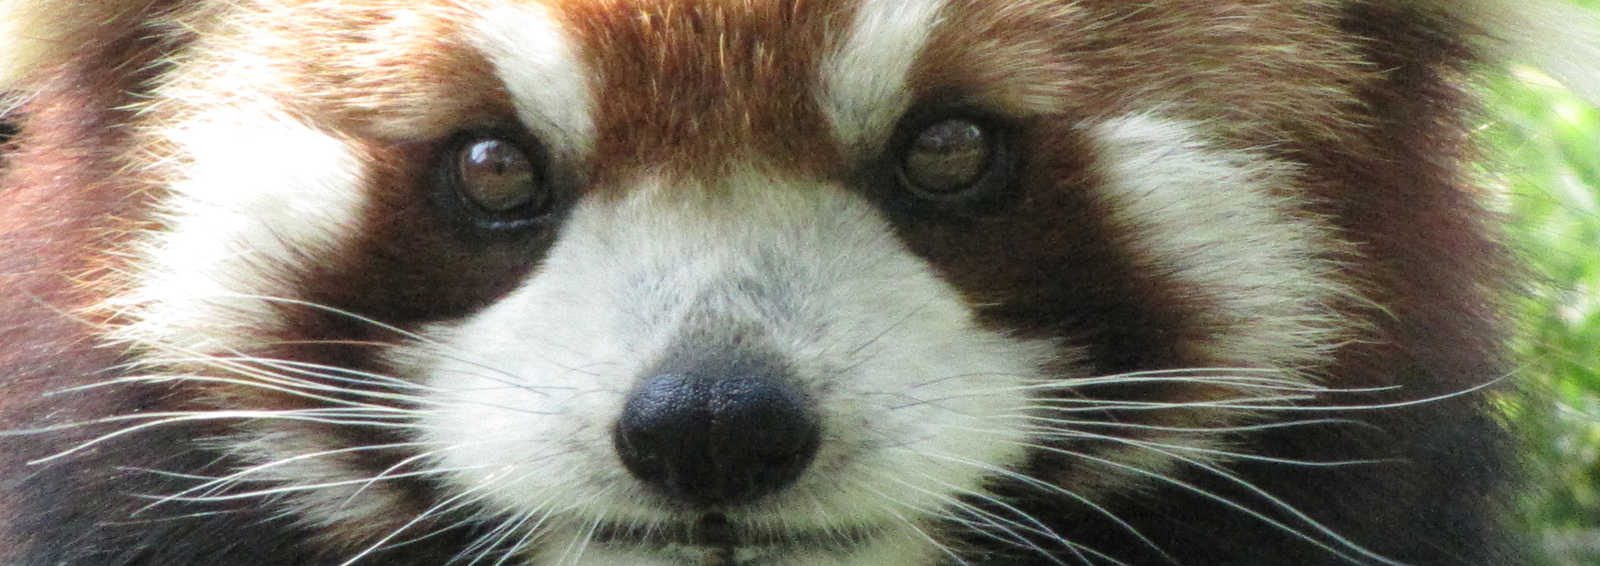 Red Panda, China